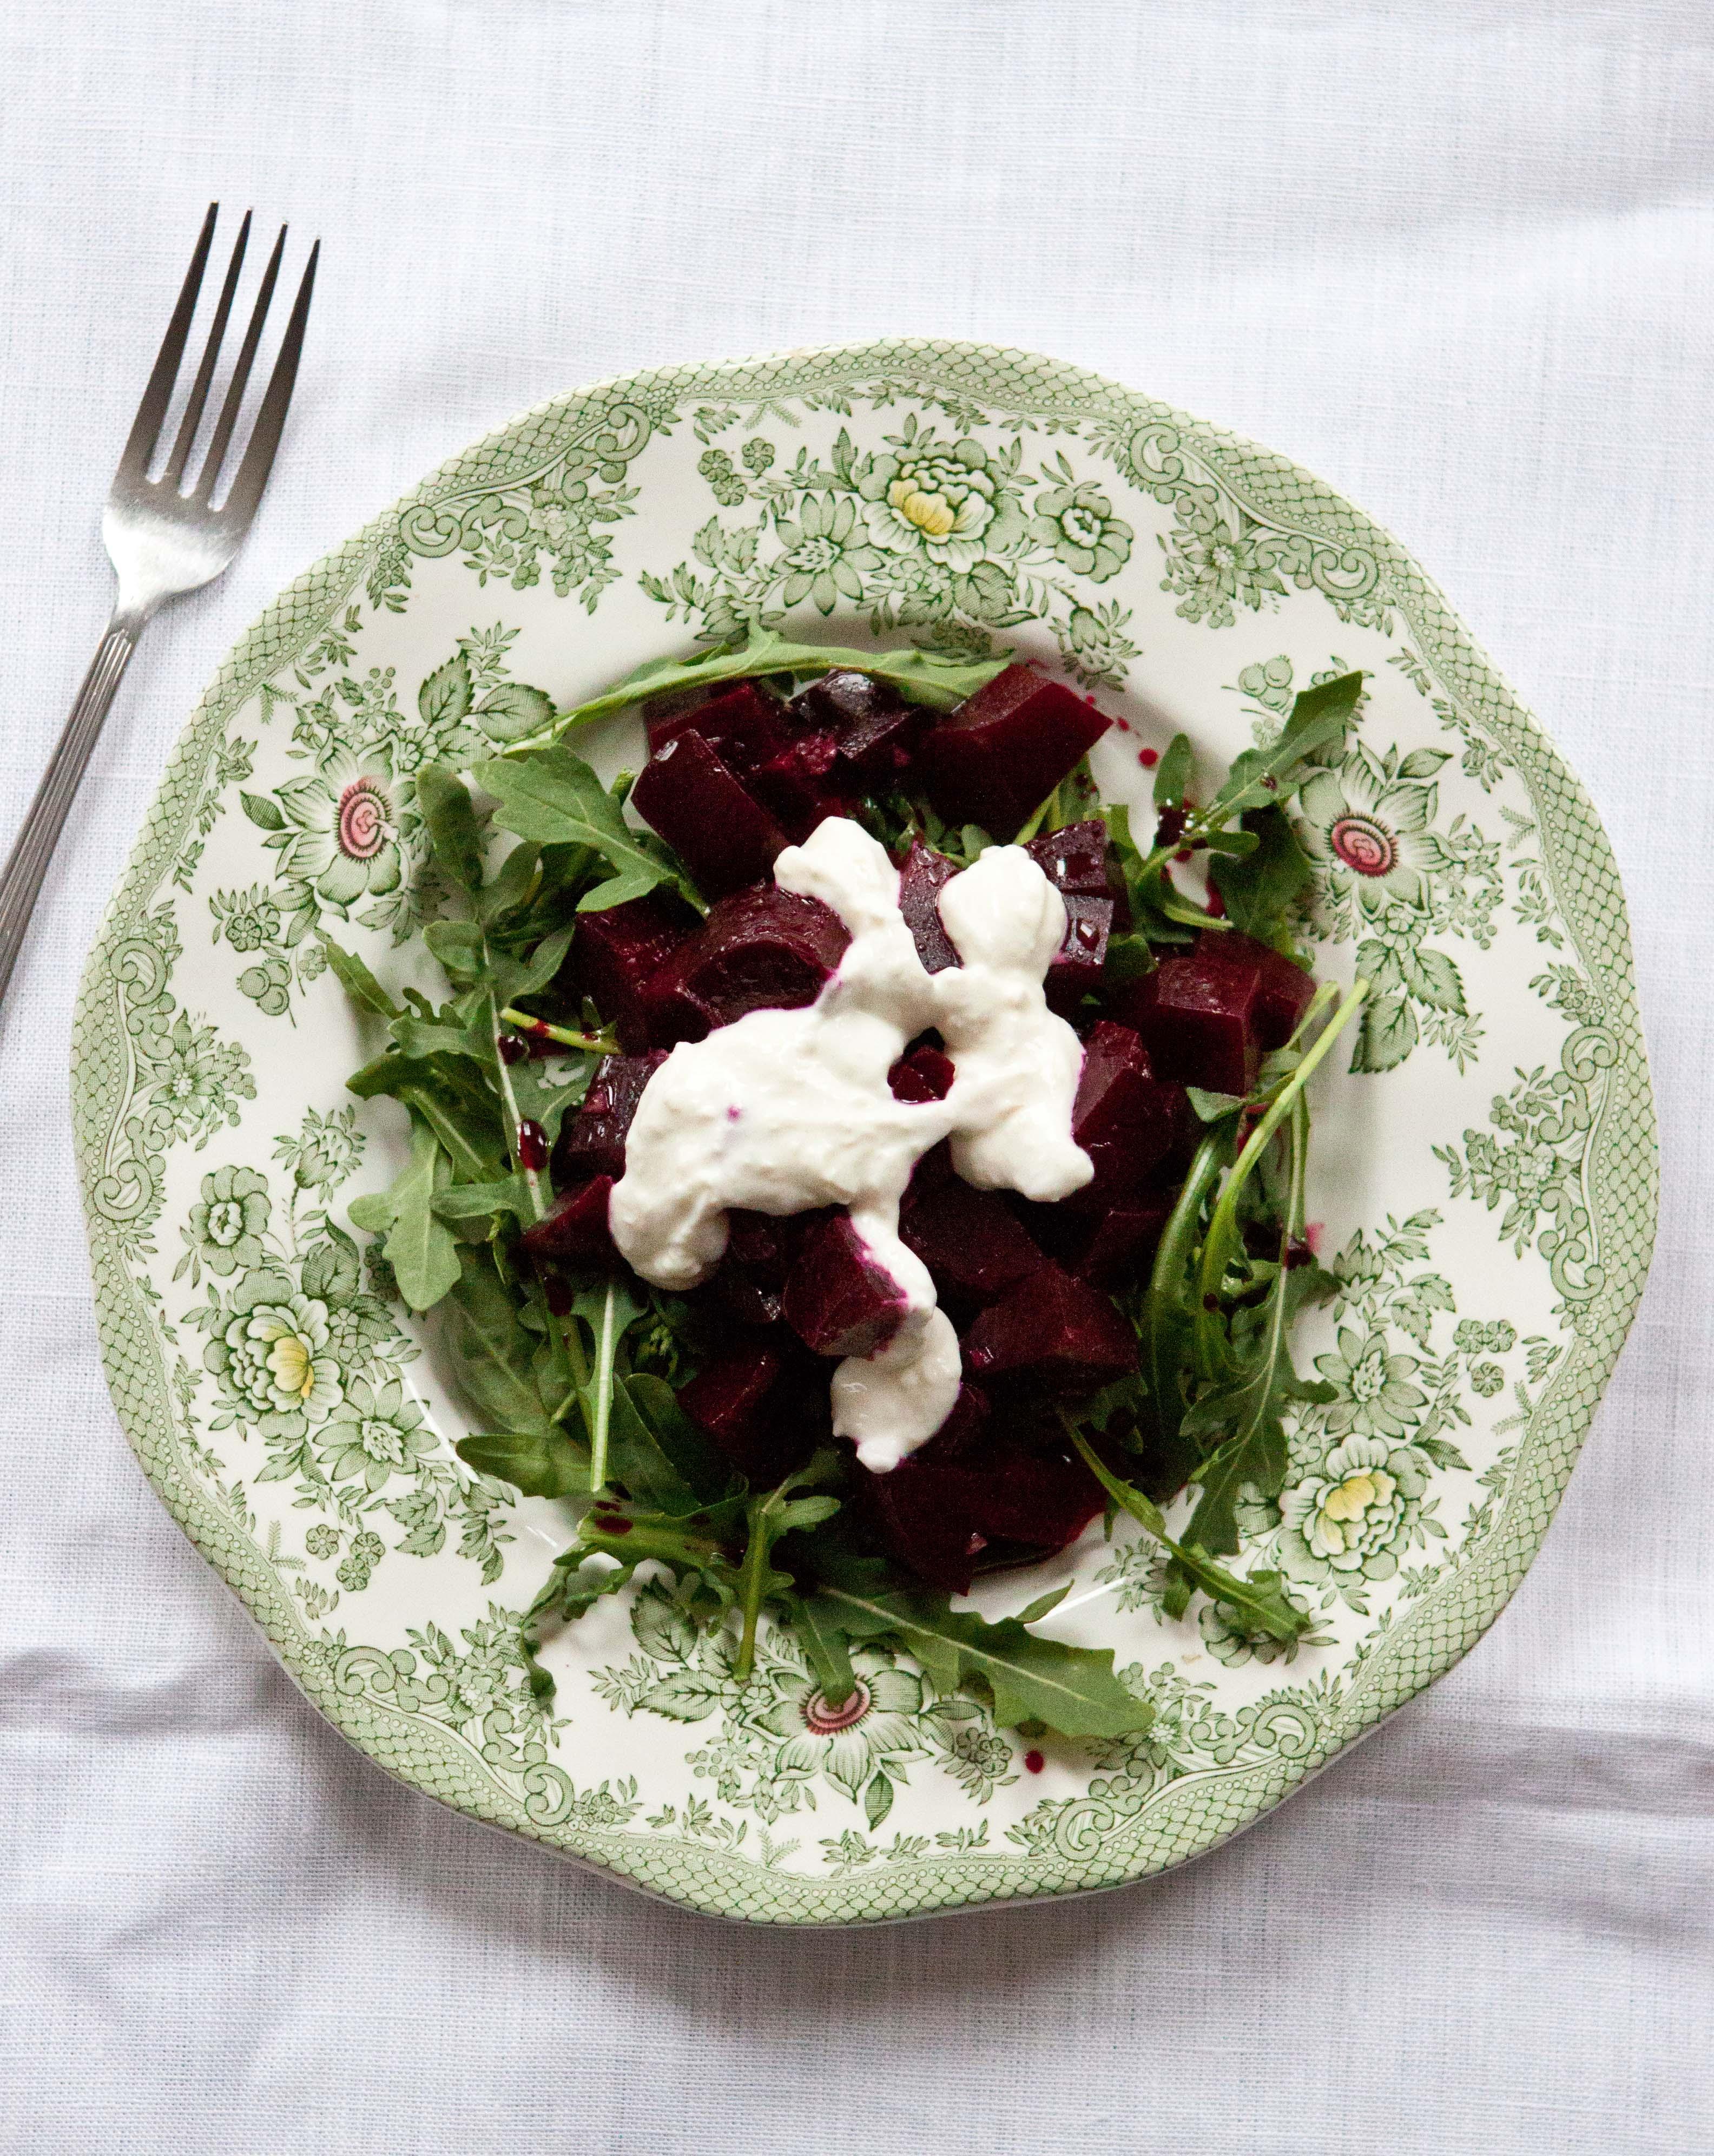 Roasted Beets and Arugula with Gorgonzola/Walnut Dressing